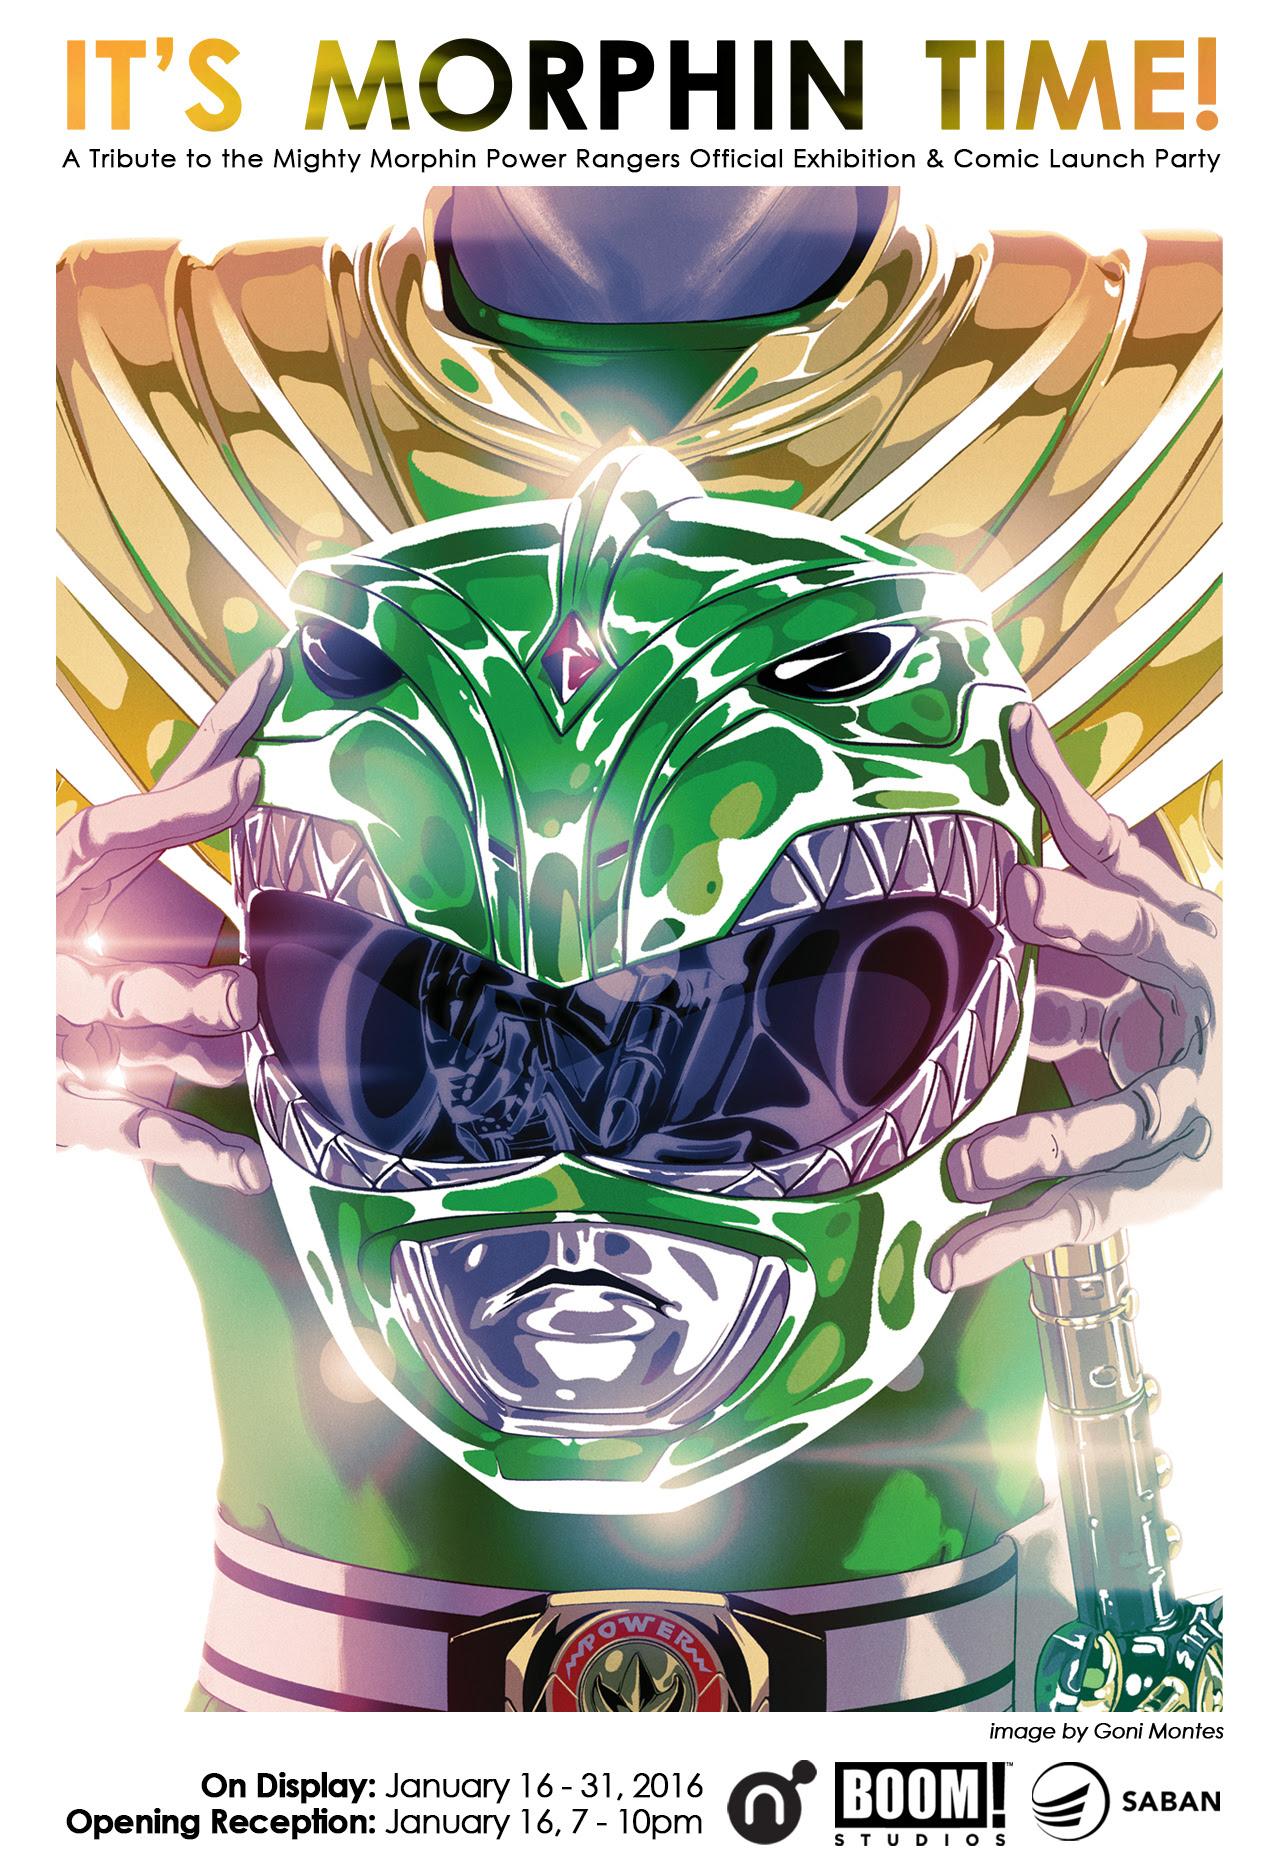 Saban Brands and Nucleus Debut 'Power Rangers' Exhibit to Celebrate New BOOM! Studios Comic